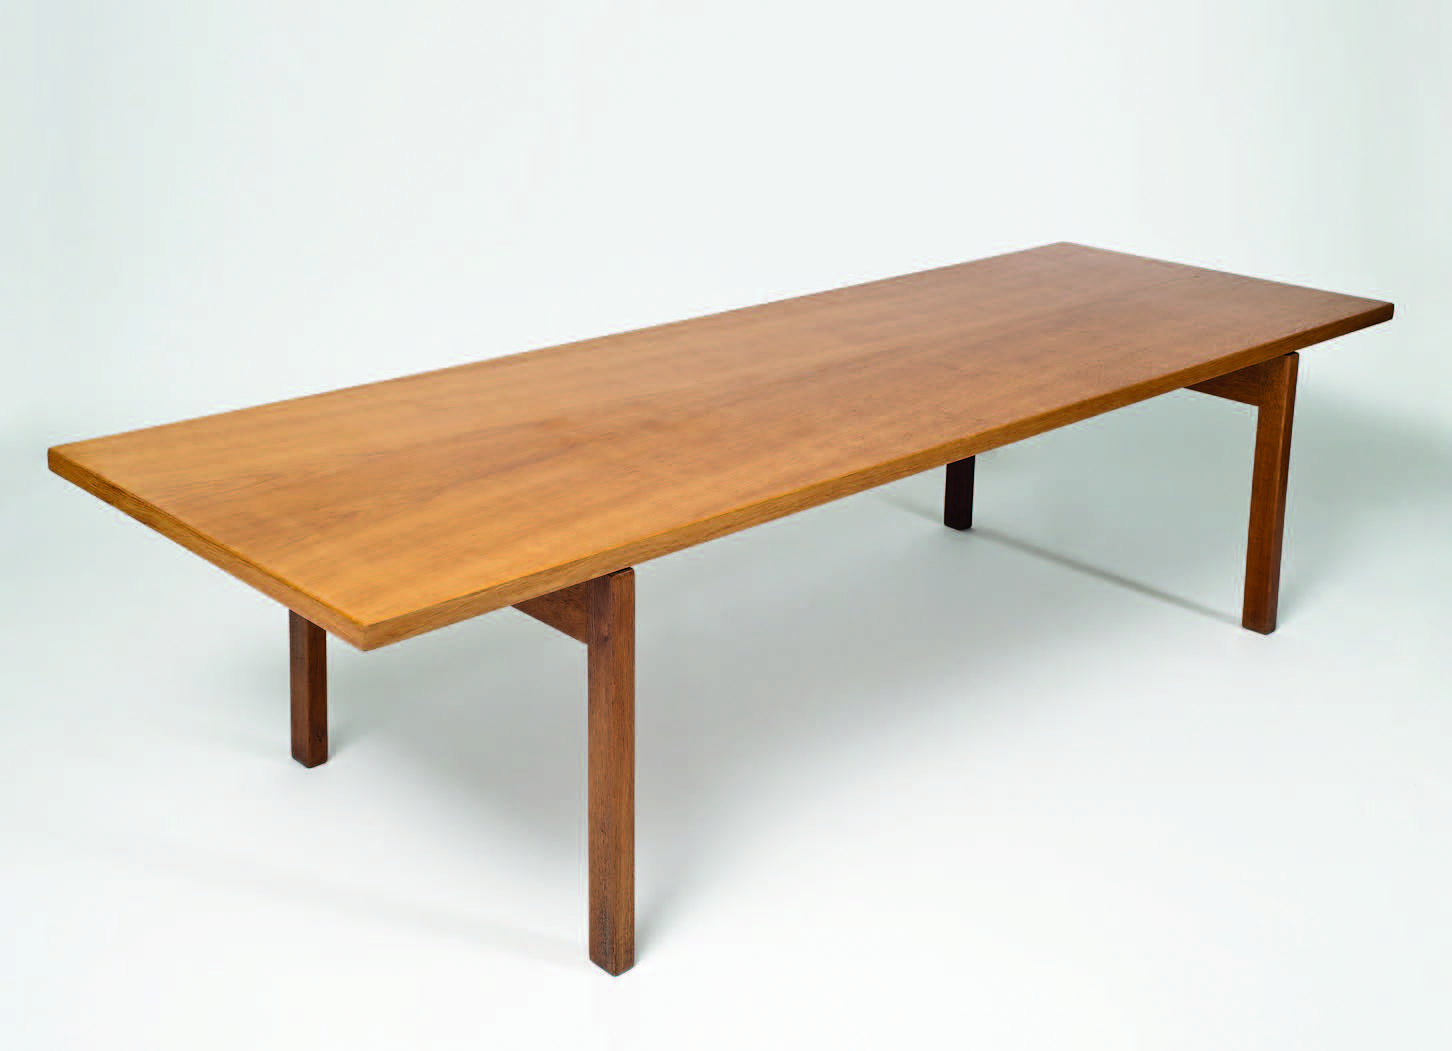 Hans Wegner Oak Coffee Table The Ross Morrison Collection Art Object Antiques Reporter